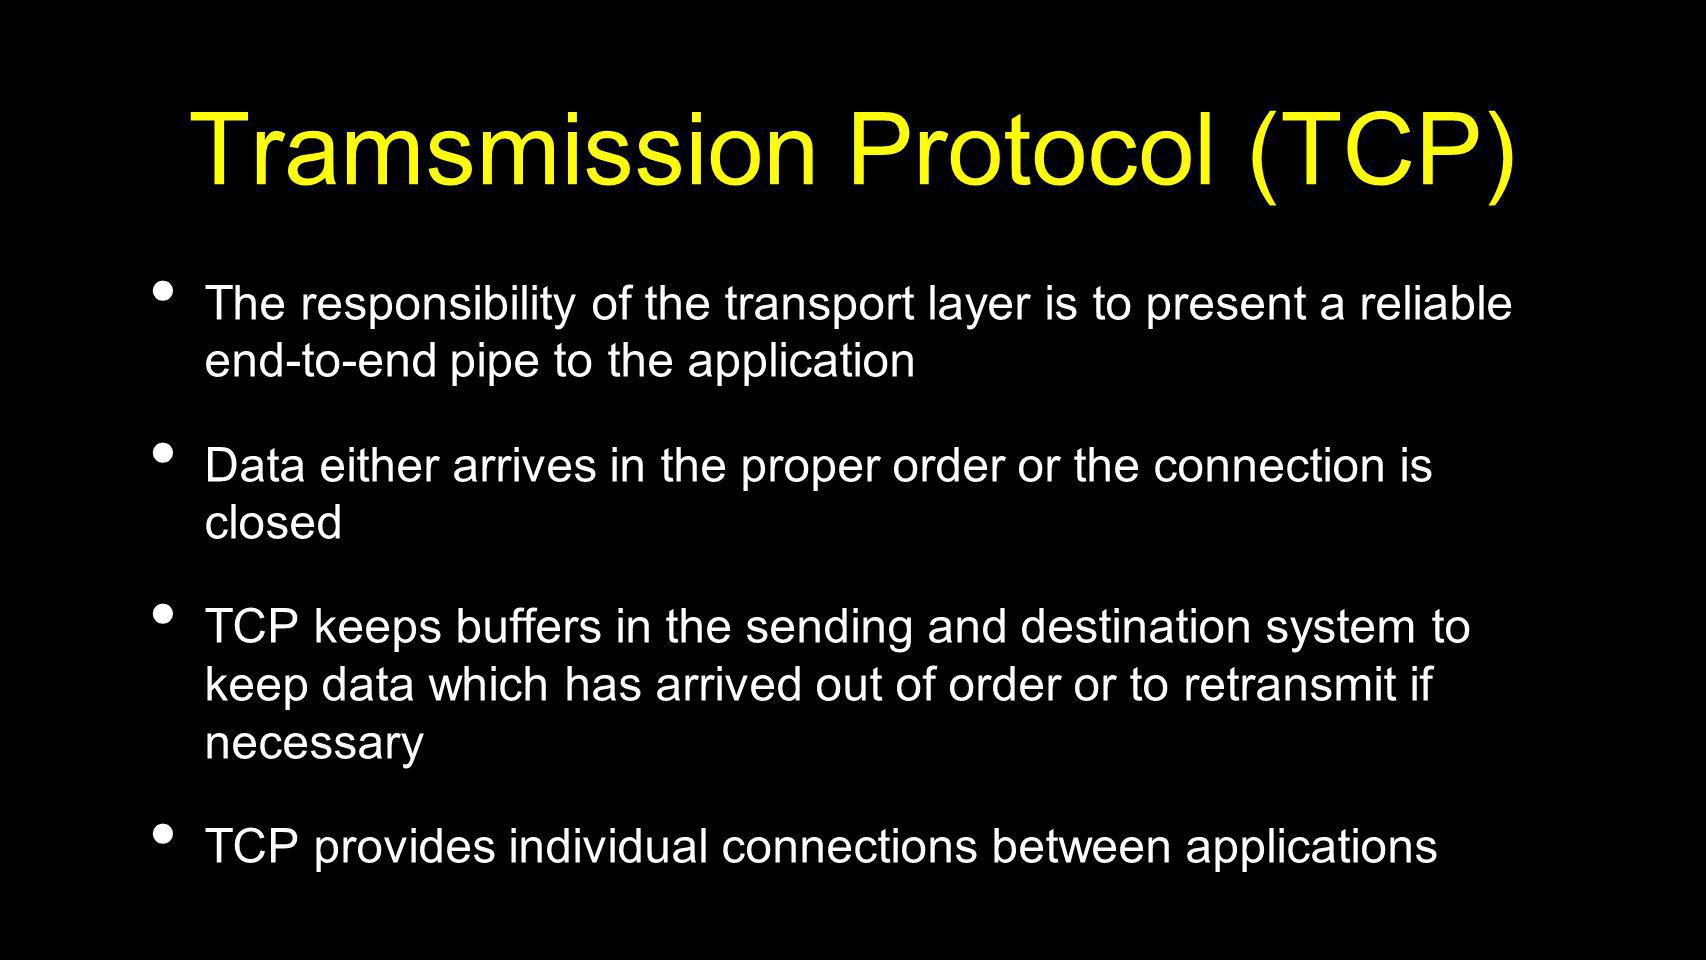 Tramsmission Protocol (TCP)